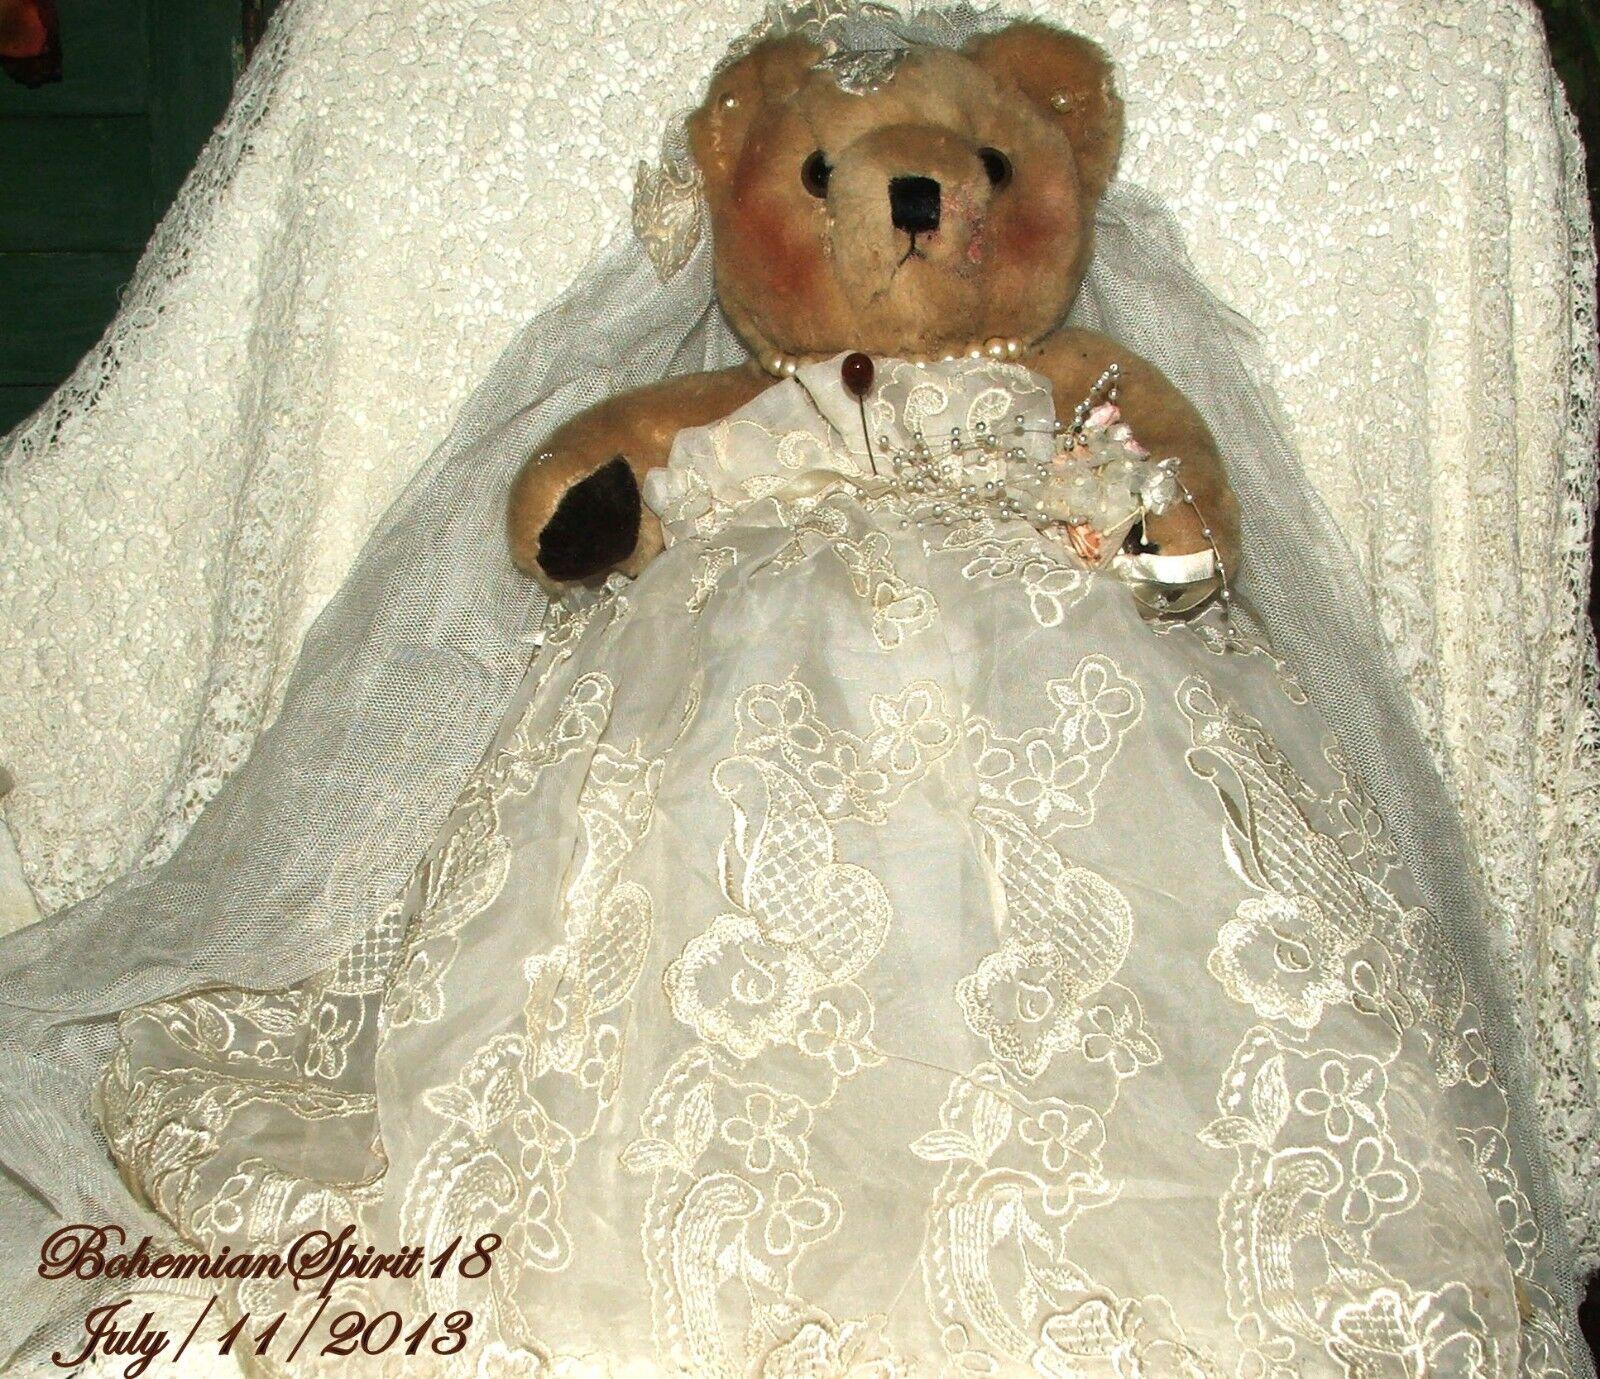 ARTISAN BRIDE AUSTRALIA WOOL POT BEARRI TM BY BOHEMIANSPIRIT ONE OF A KIND BEAR